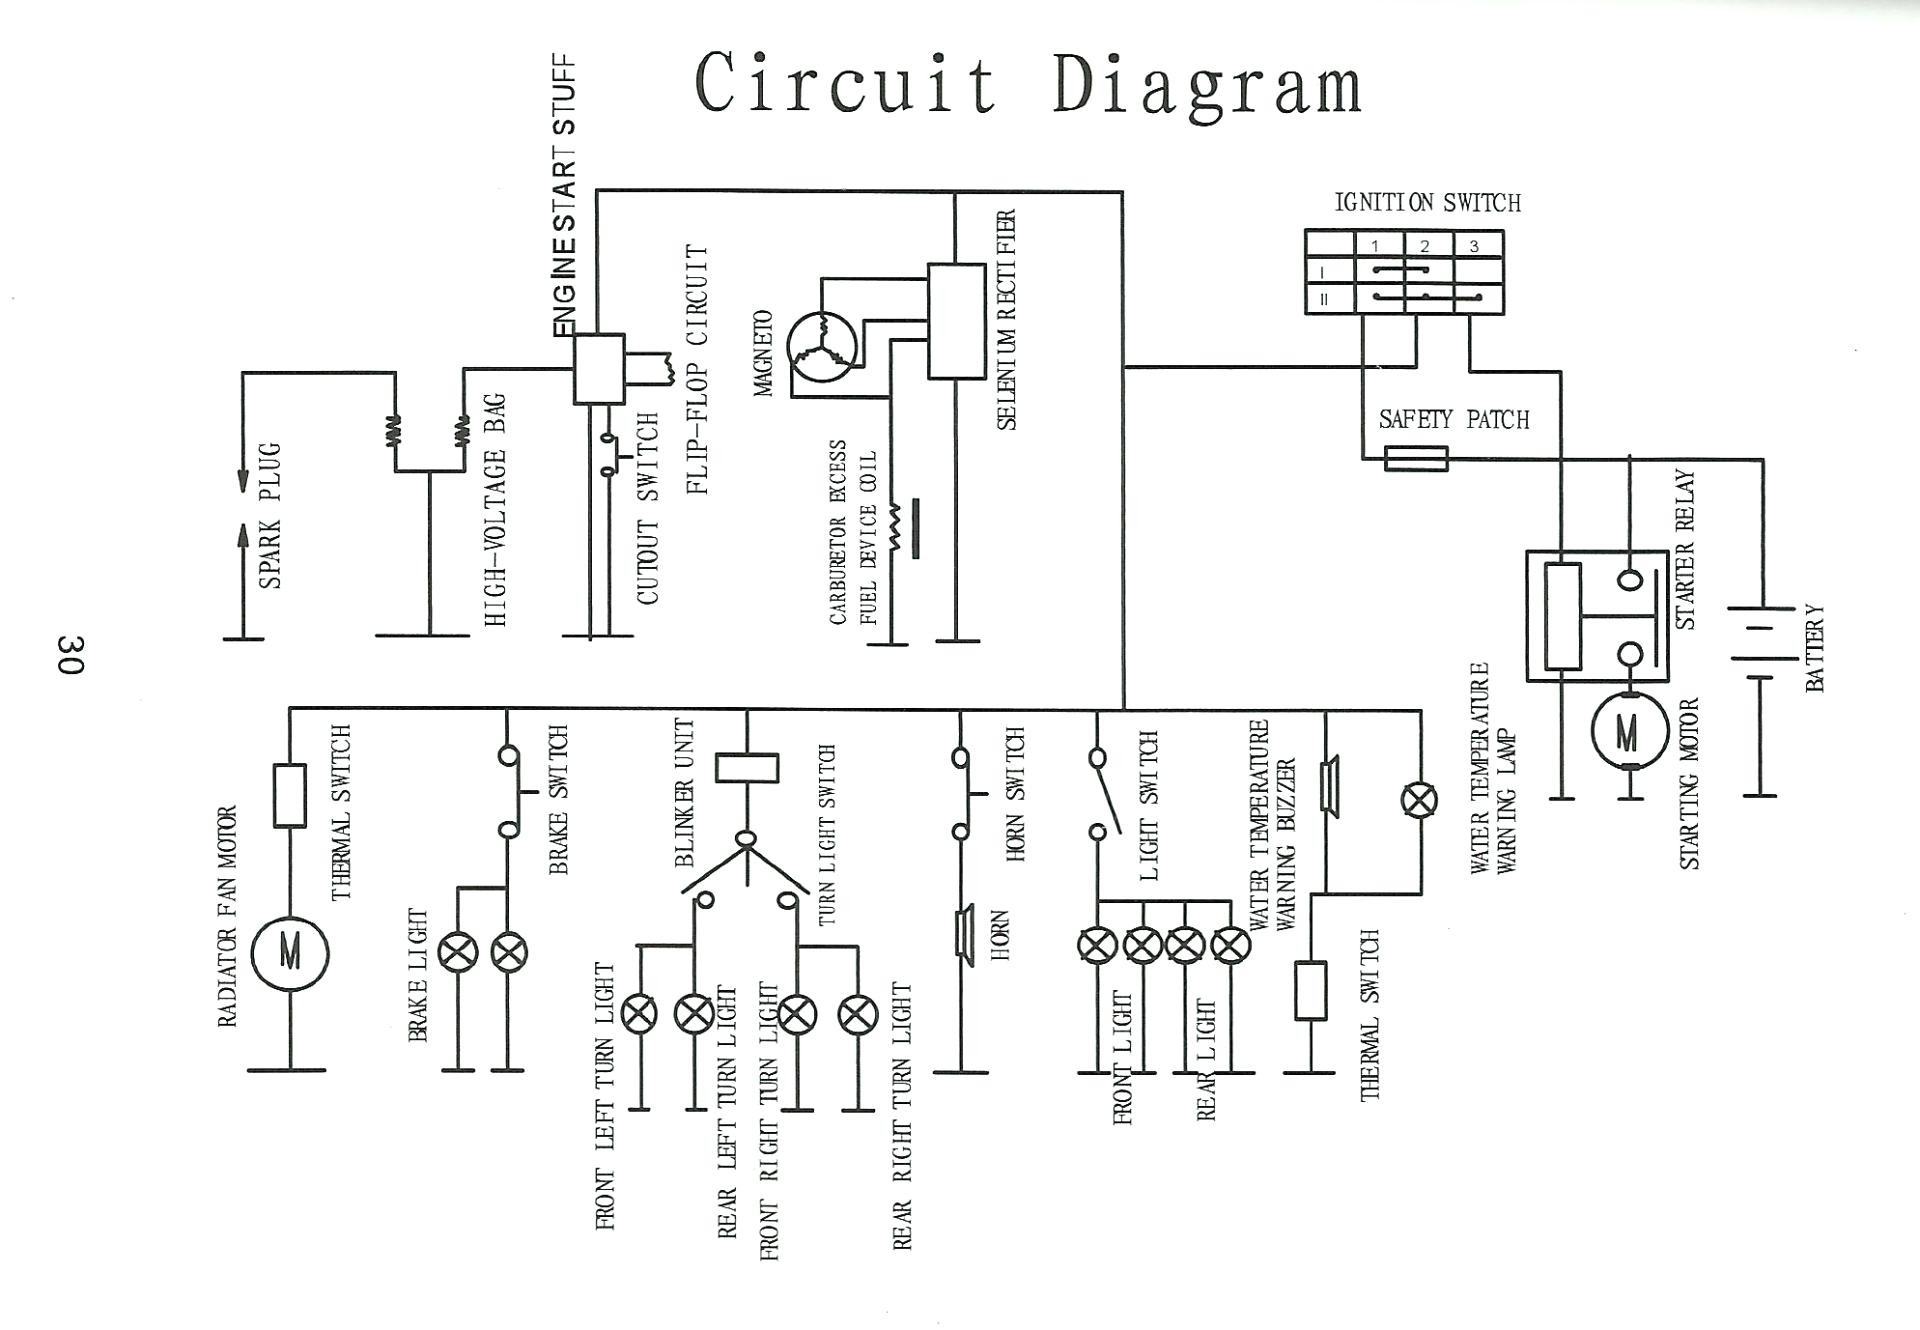 Tao Tao 150Cc Scooter Wiring Diagram | Wiring Diagram - 150Cc Scooter Wiring Diagram